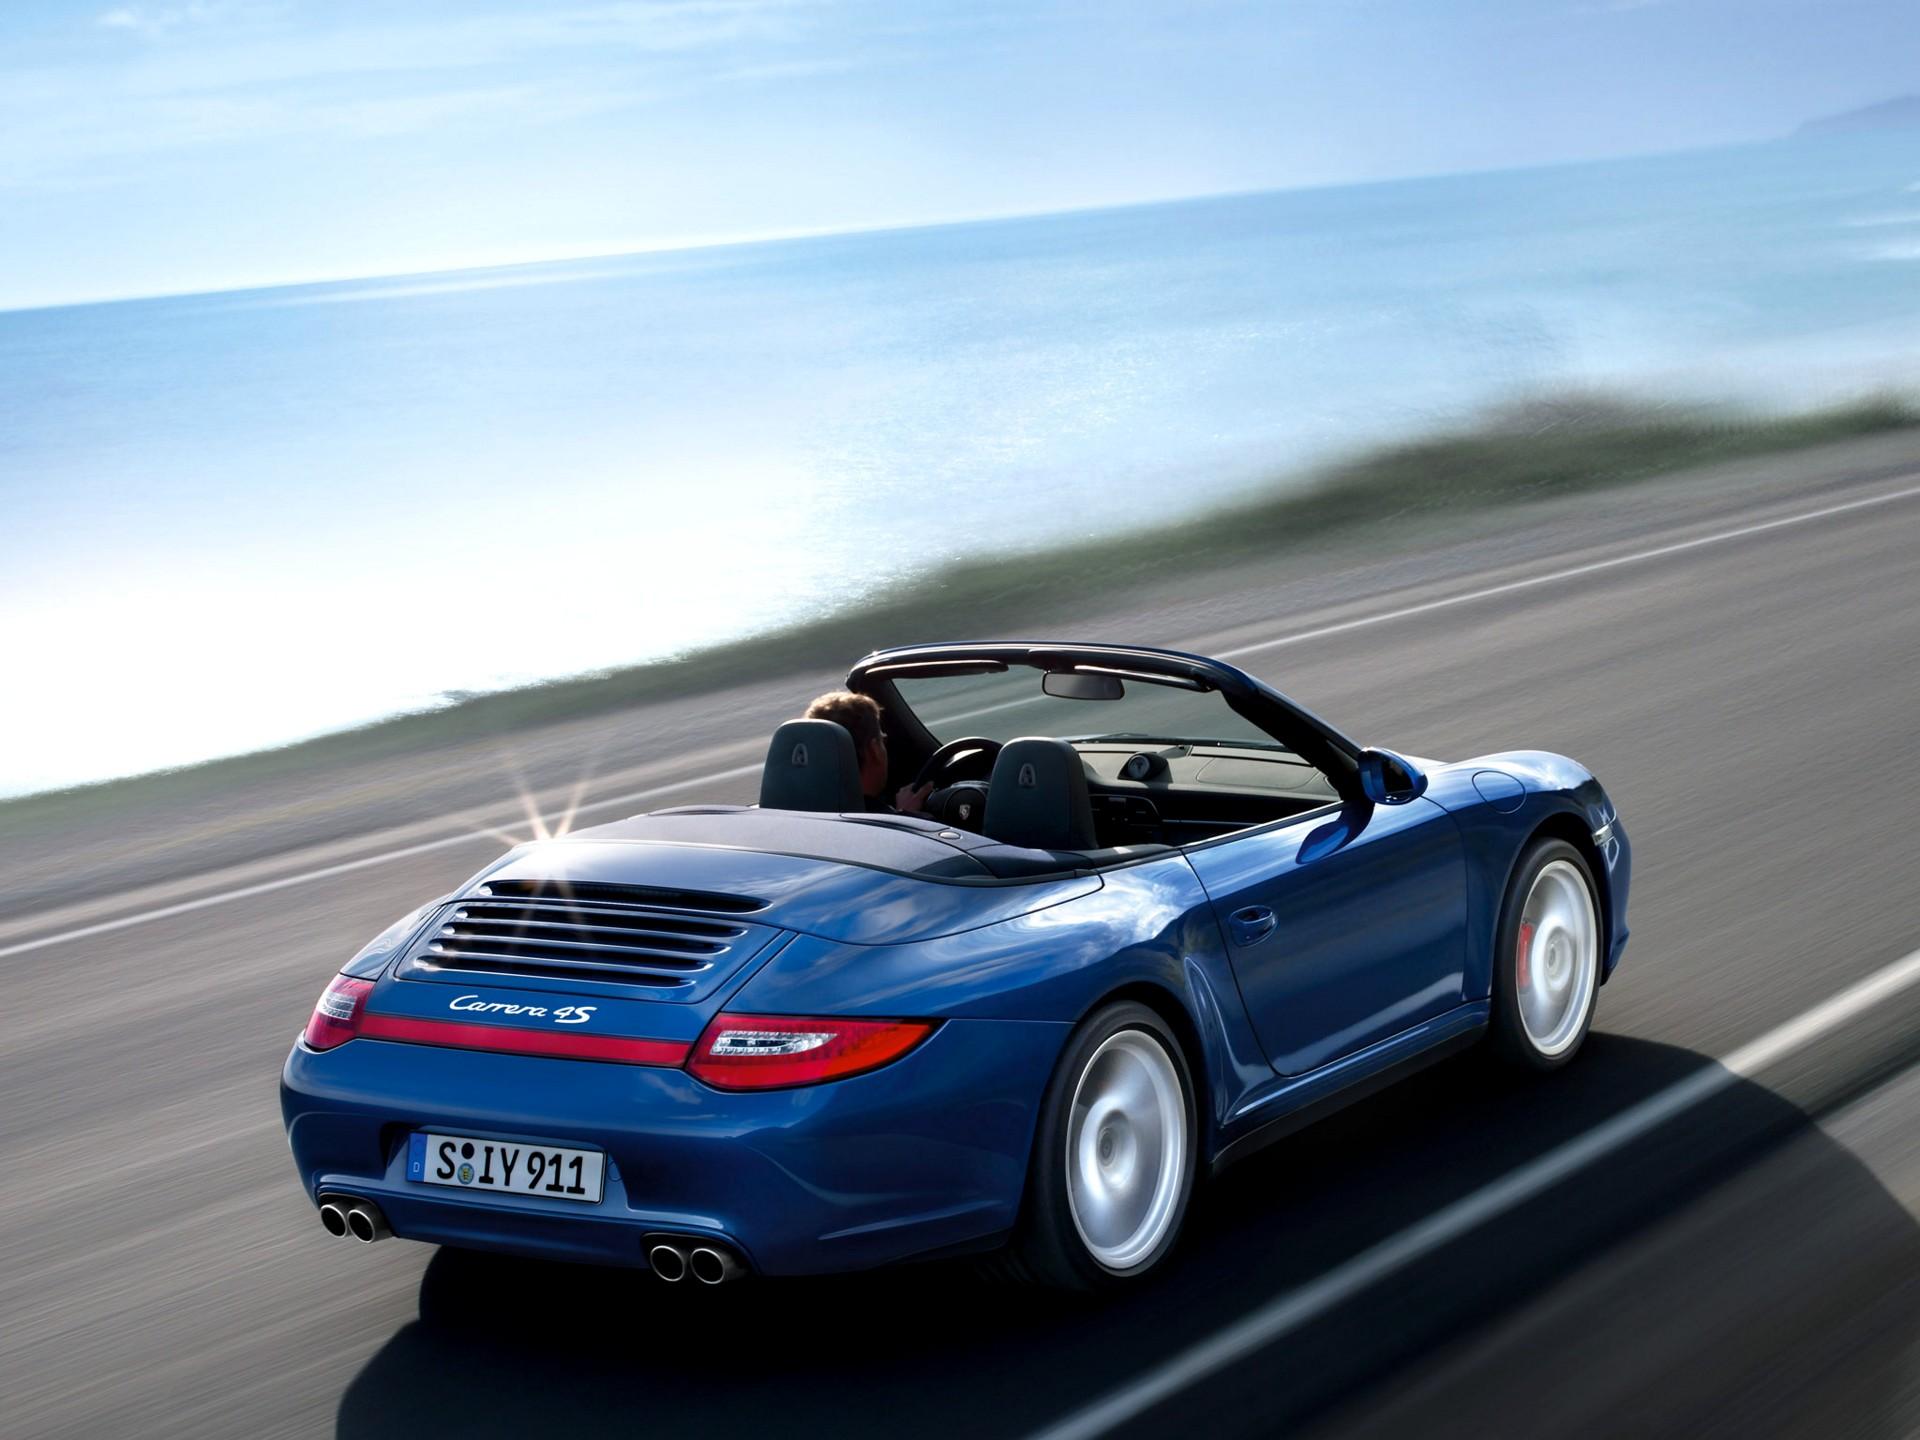 porsche 911 carrera 4s cabriolet 997 specs photos 2008 2009 2010 2011 2012 autoevolution. Black Bedroom Furniture Sets. Home Design Ideas